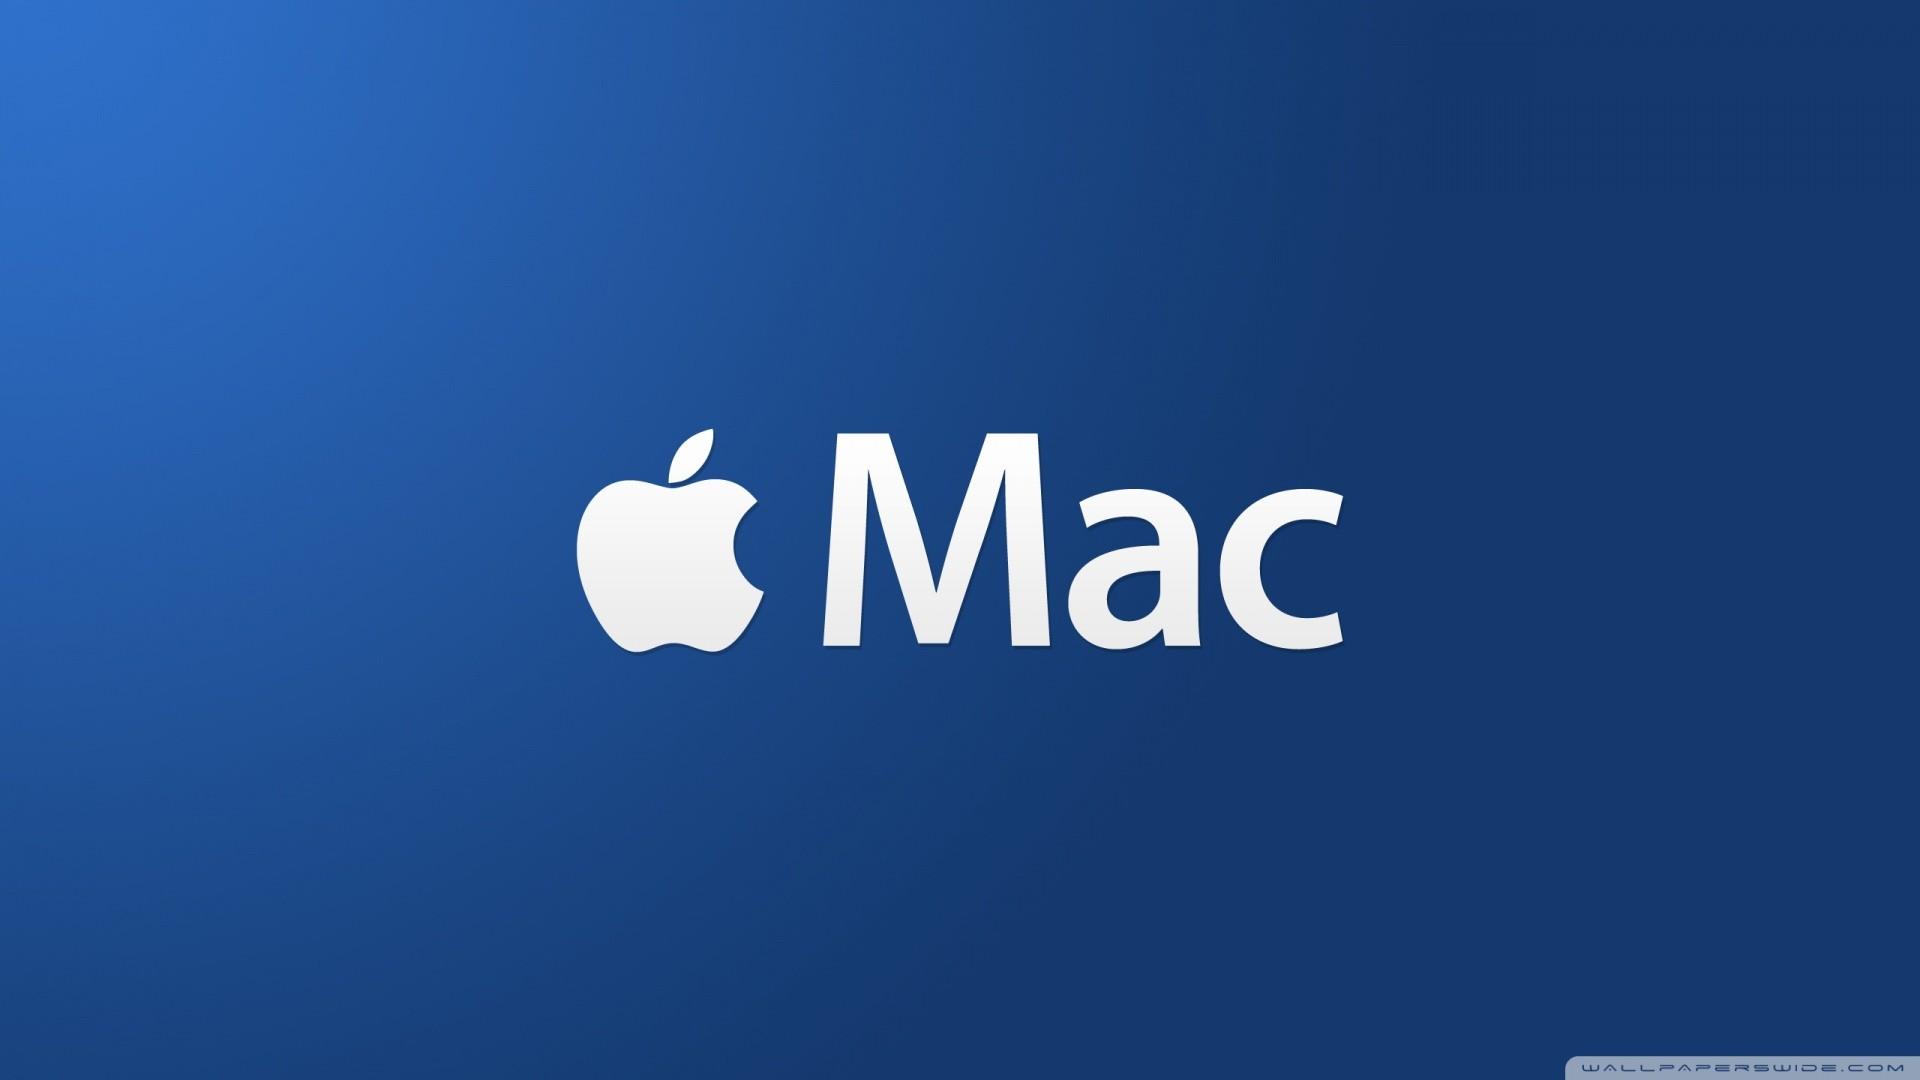 Apple Mac Wallpaper Apple, Mac